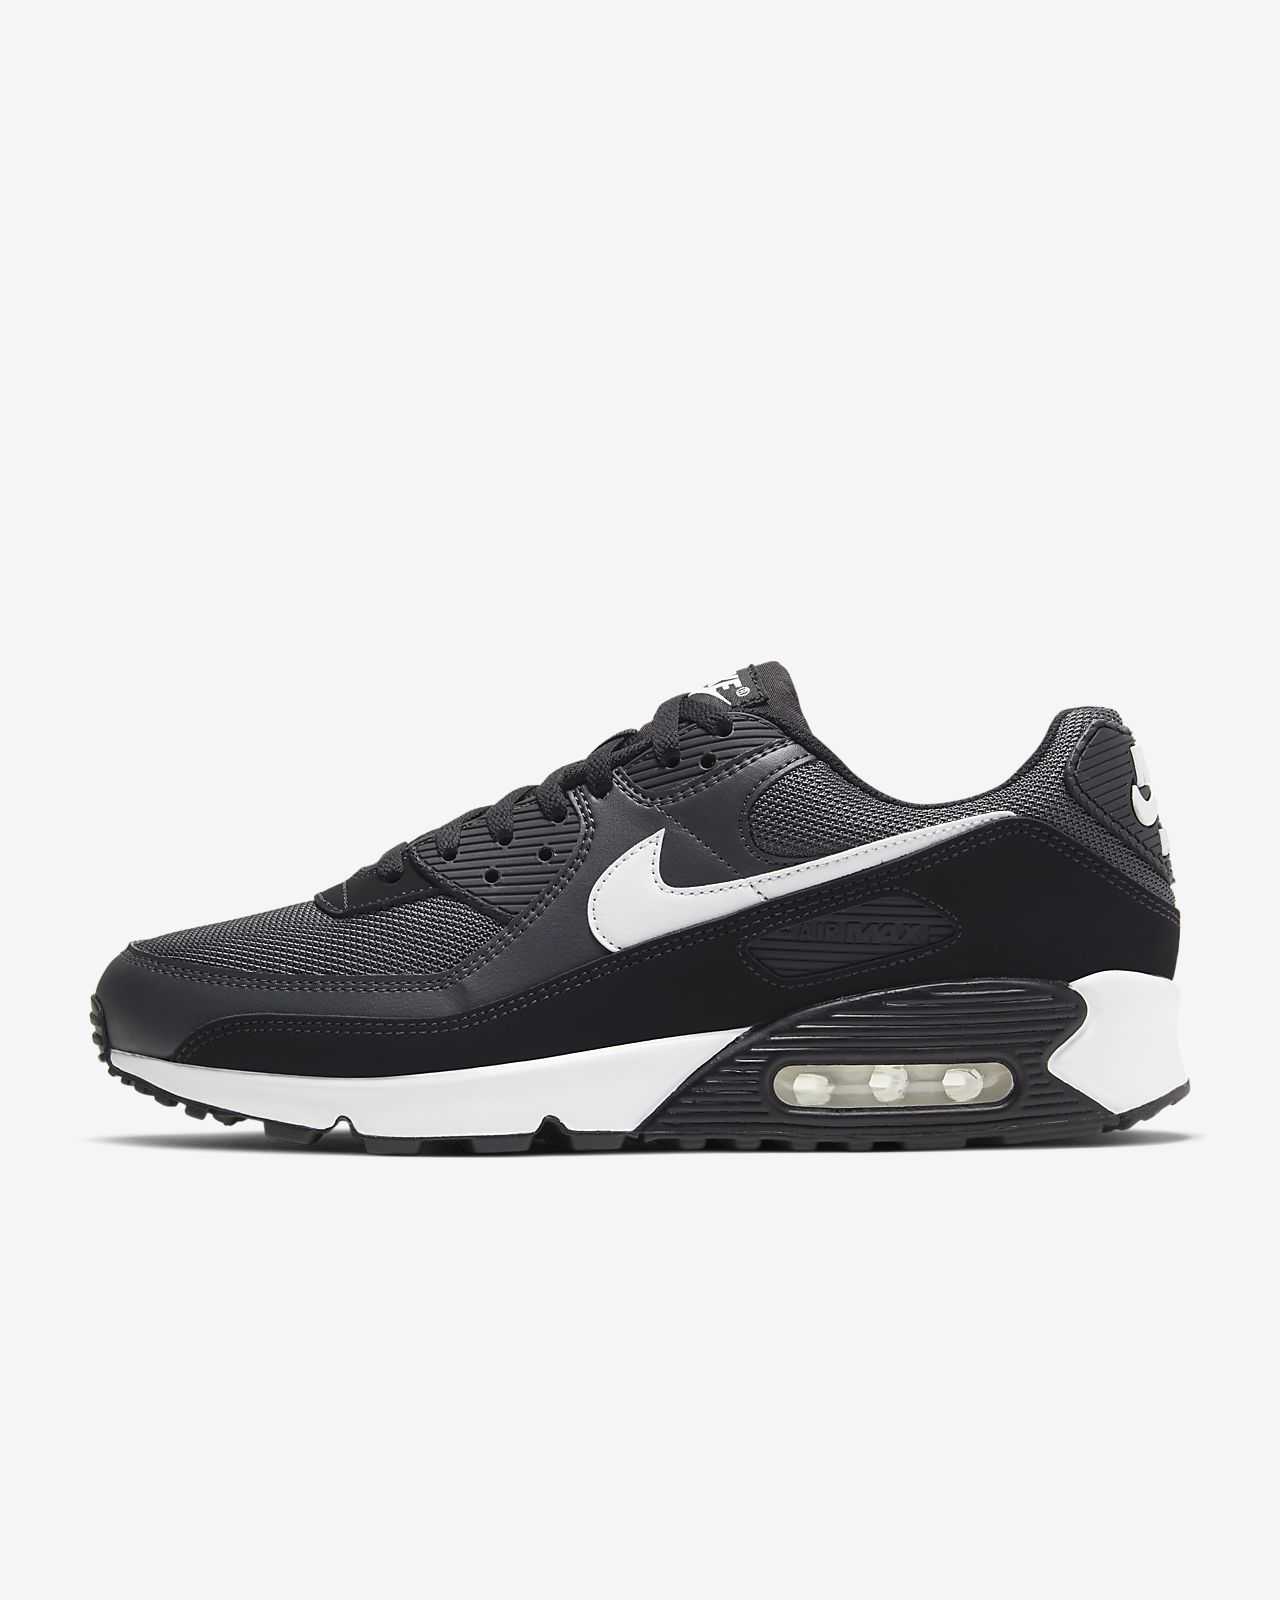 Schuhe Günstige Günstige Nike Günstige Schuhe Nike 1JFcl3TK